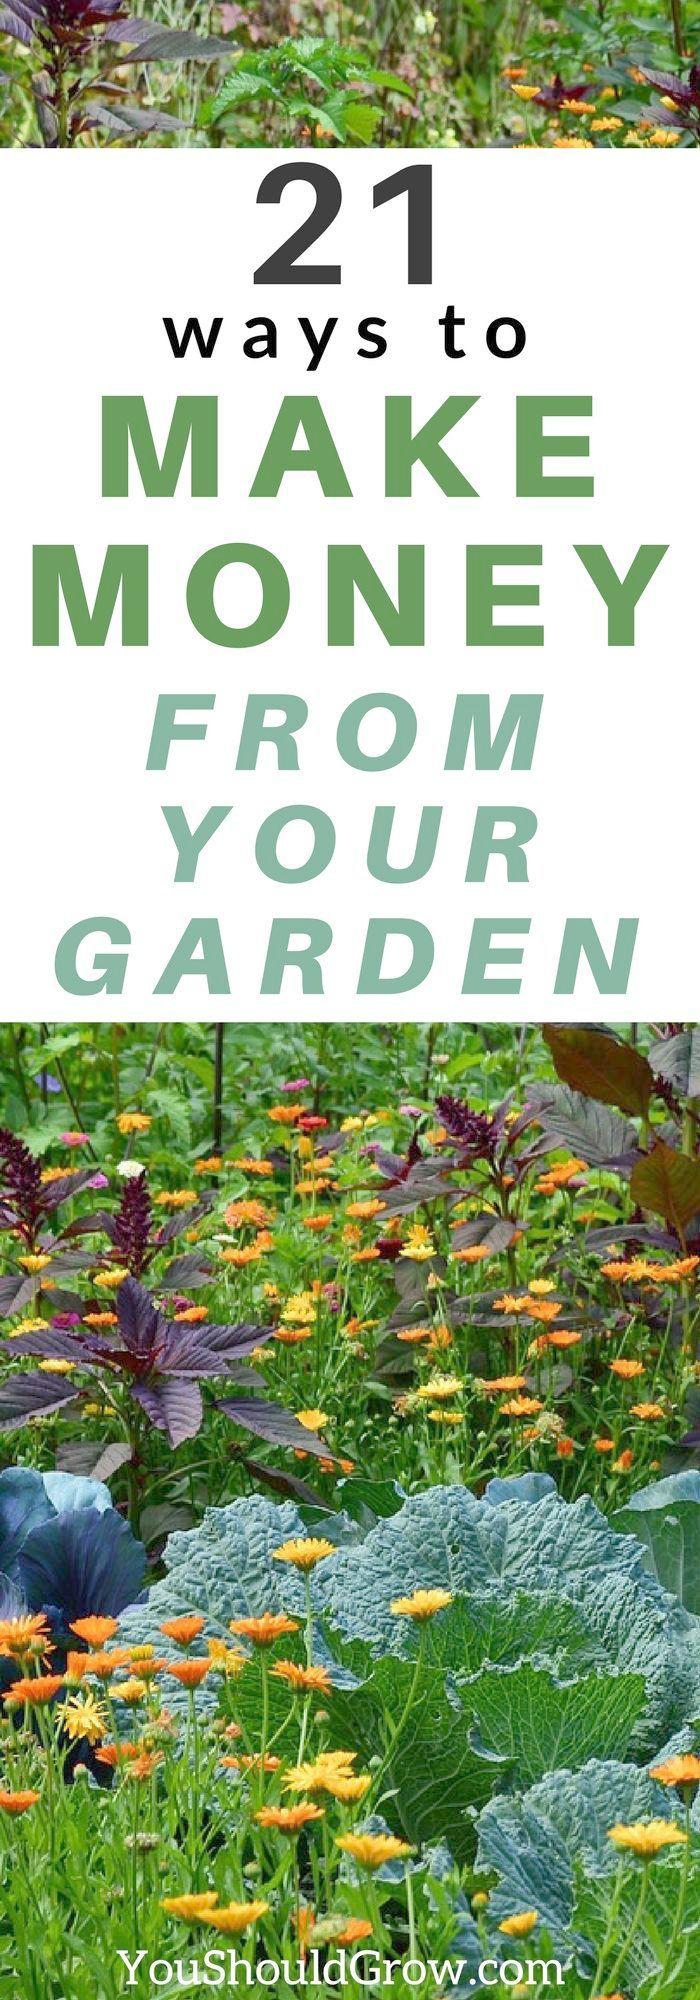 Gardening Tools Dubai an Gardening Tips For Strawberries per Gardening Tips For …